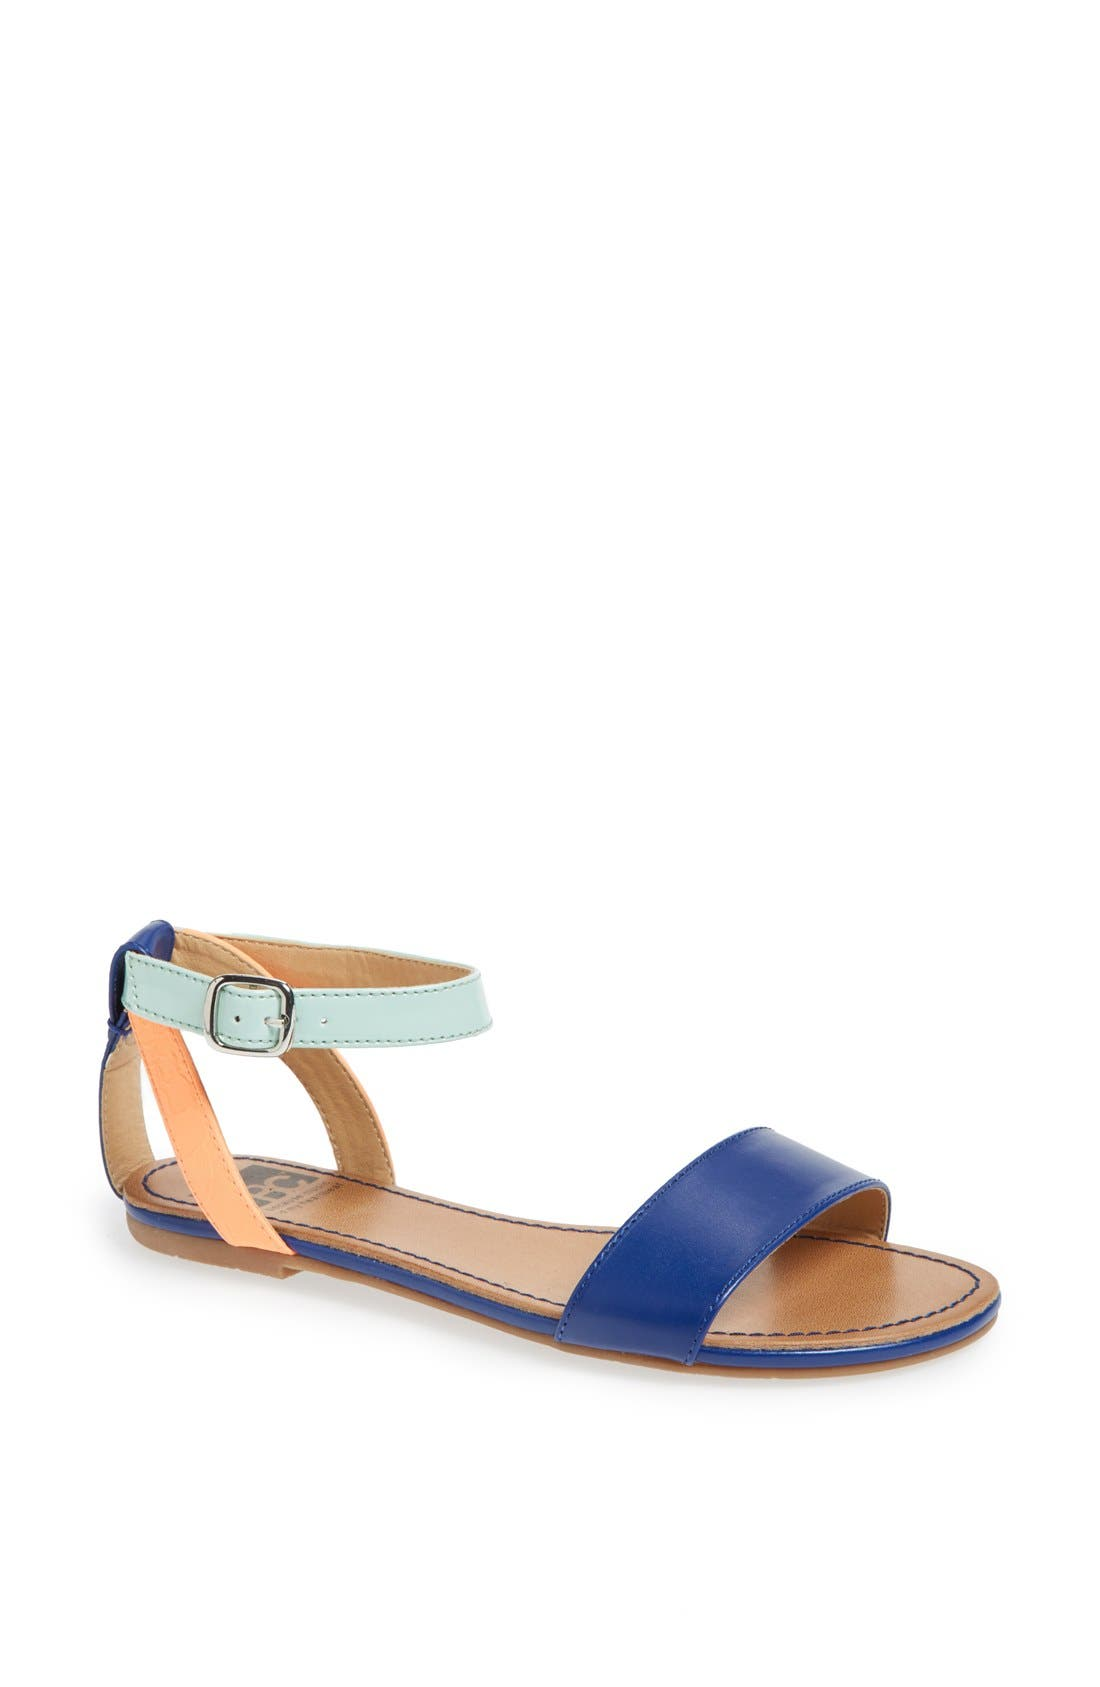 Main Image - BC Footwear 'Natural Instincts' Sandal